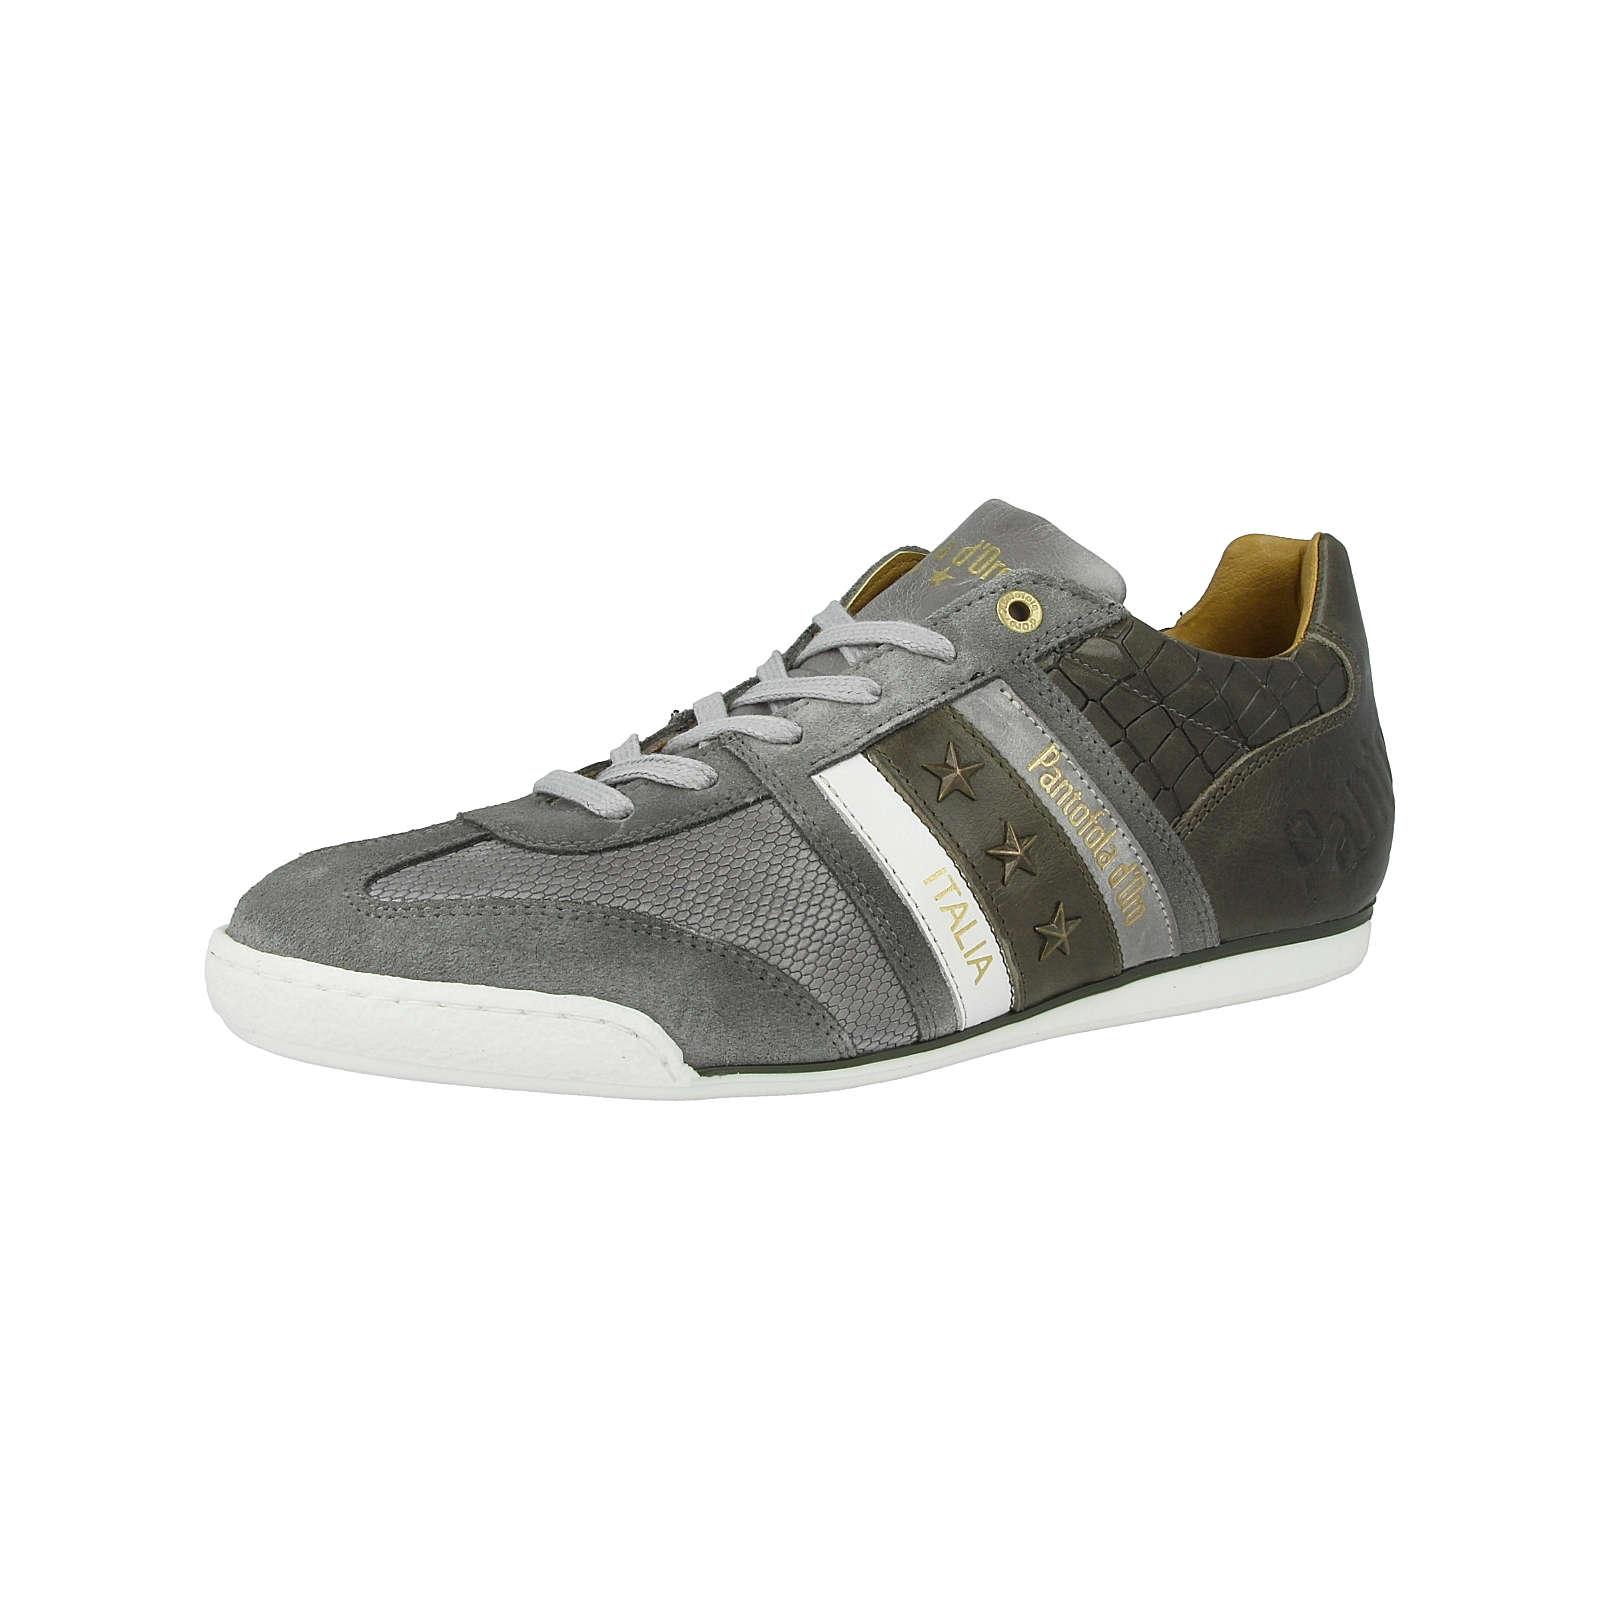 Pantofola d´Oro Schuhe Imola Crocco Uomo Low Schnürschuhe grau Herren Gr. 42